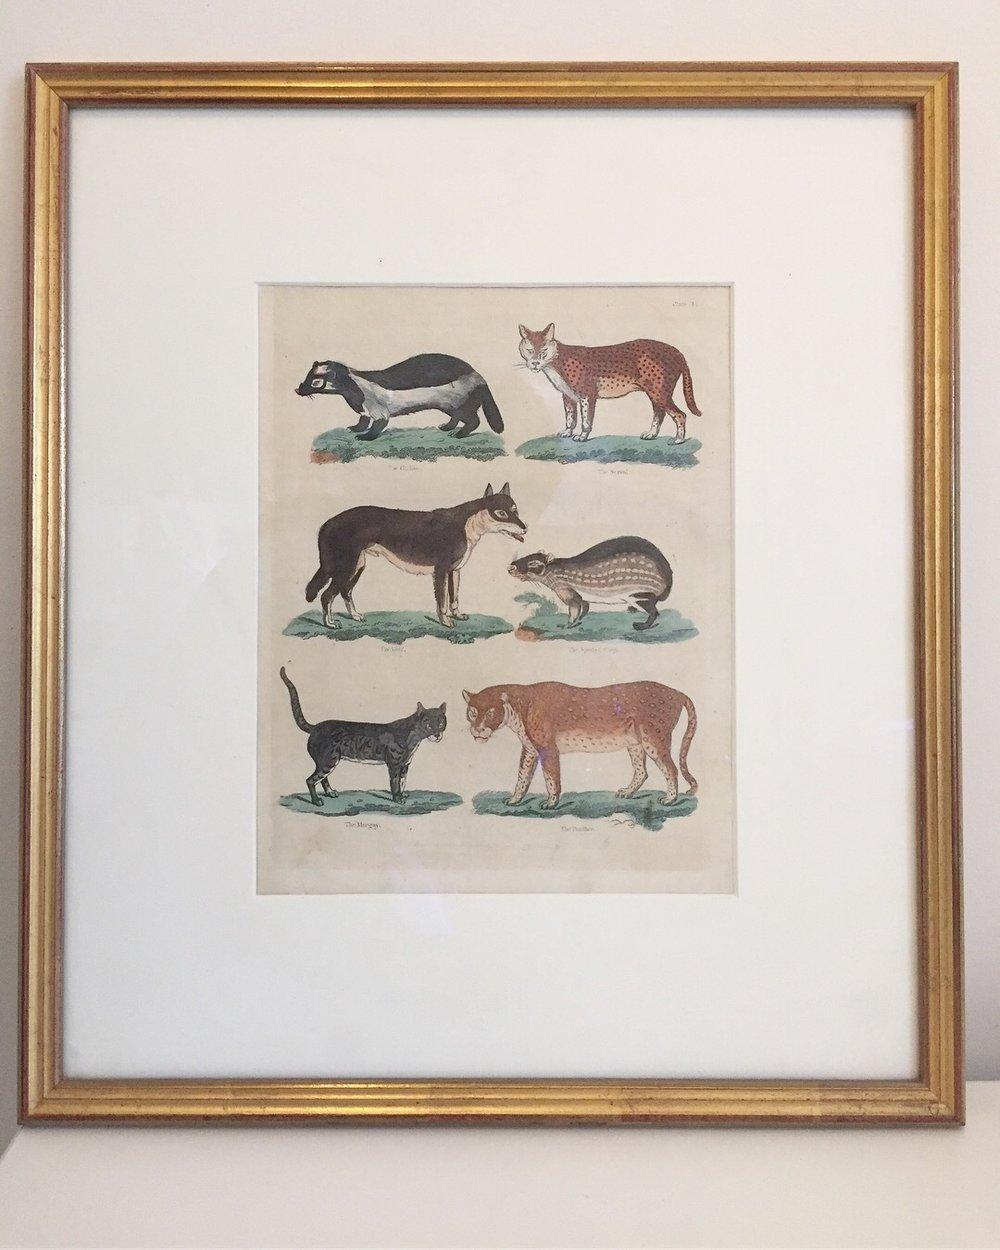 Early German engraving depicting mammals - Circa 18007.5